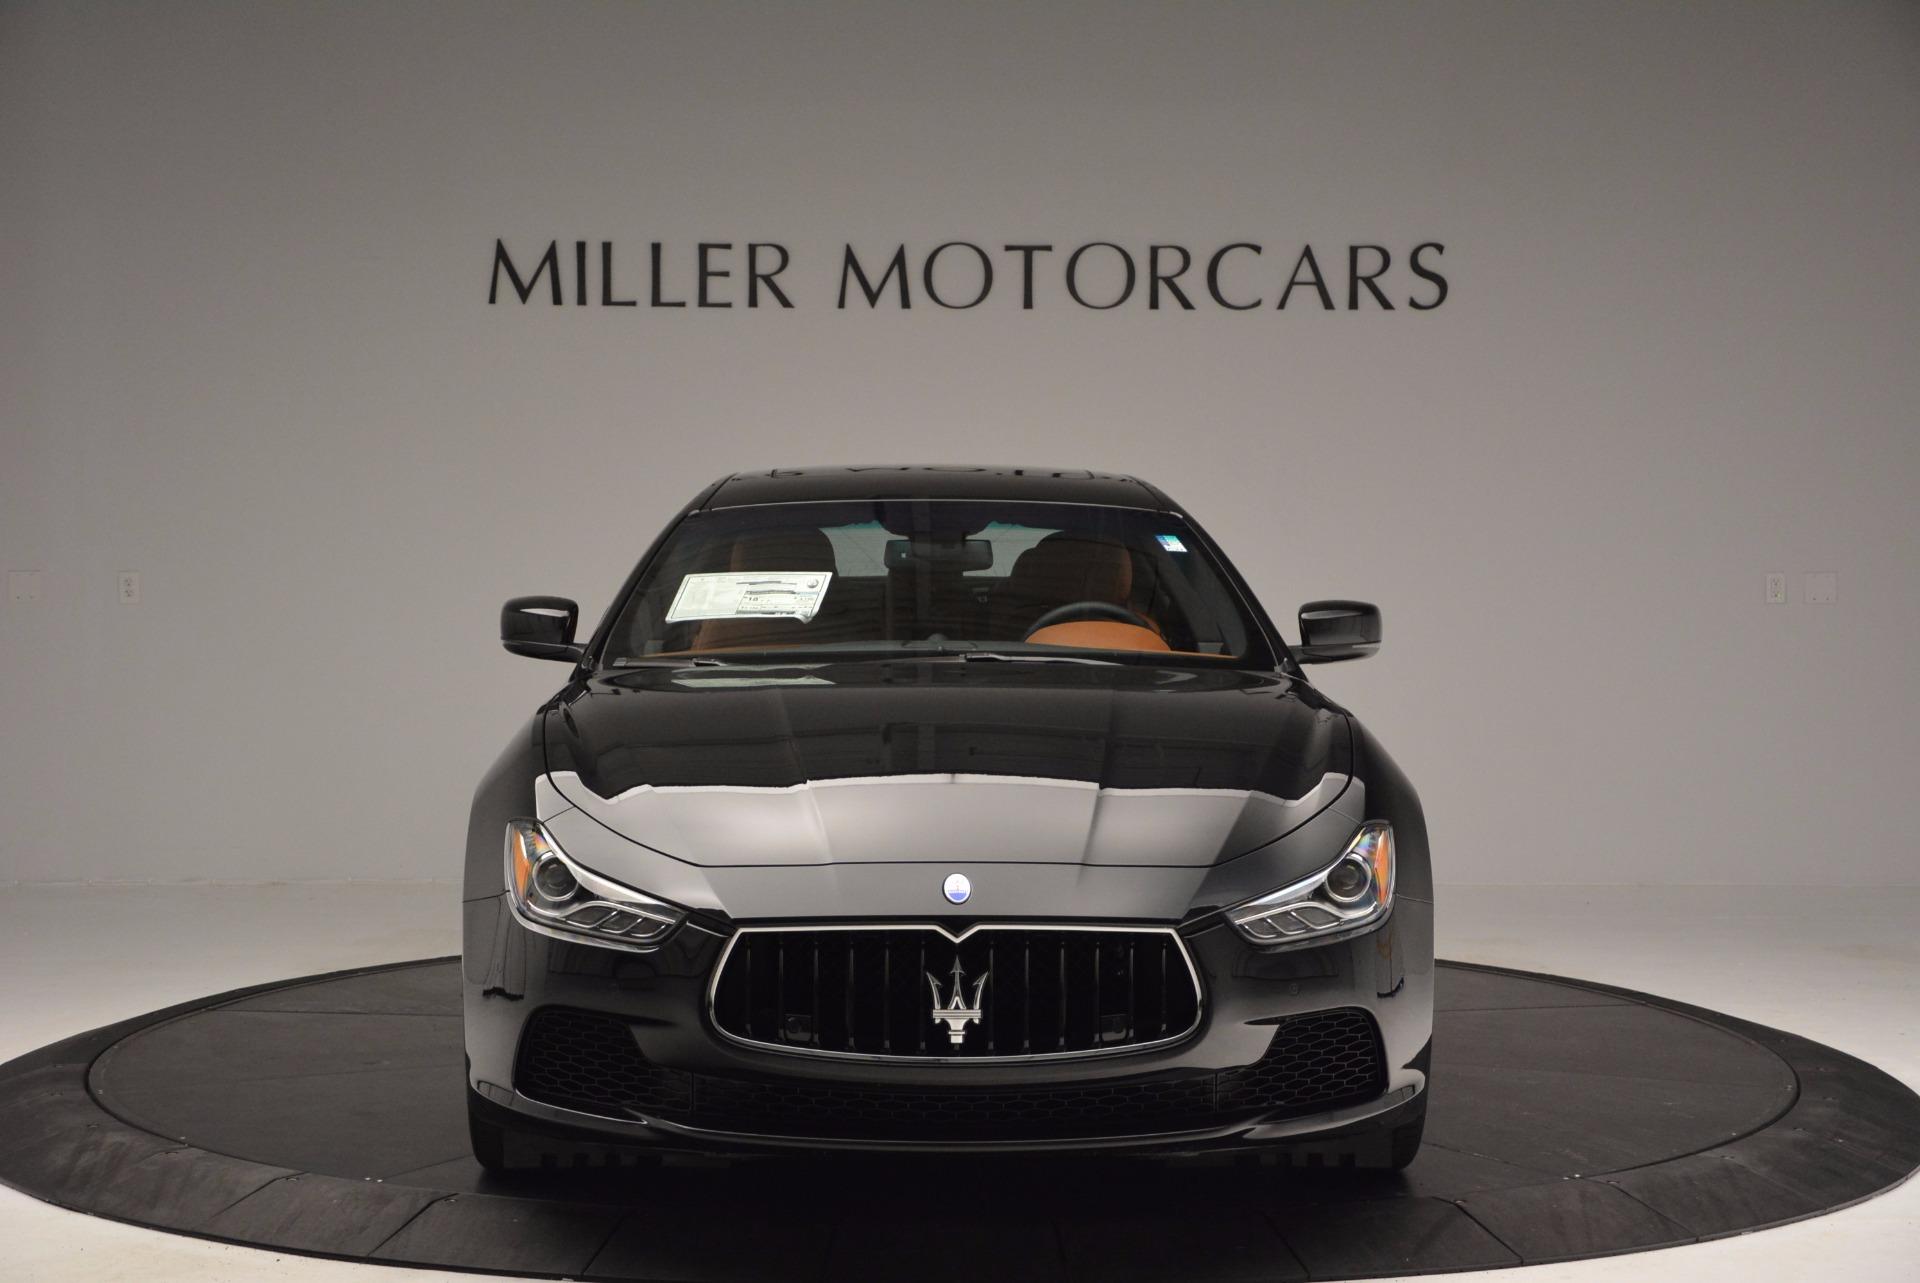 Used 2017 Maserati Ghibli S Q4 For Sale In Greenwich, CT 682_p12